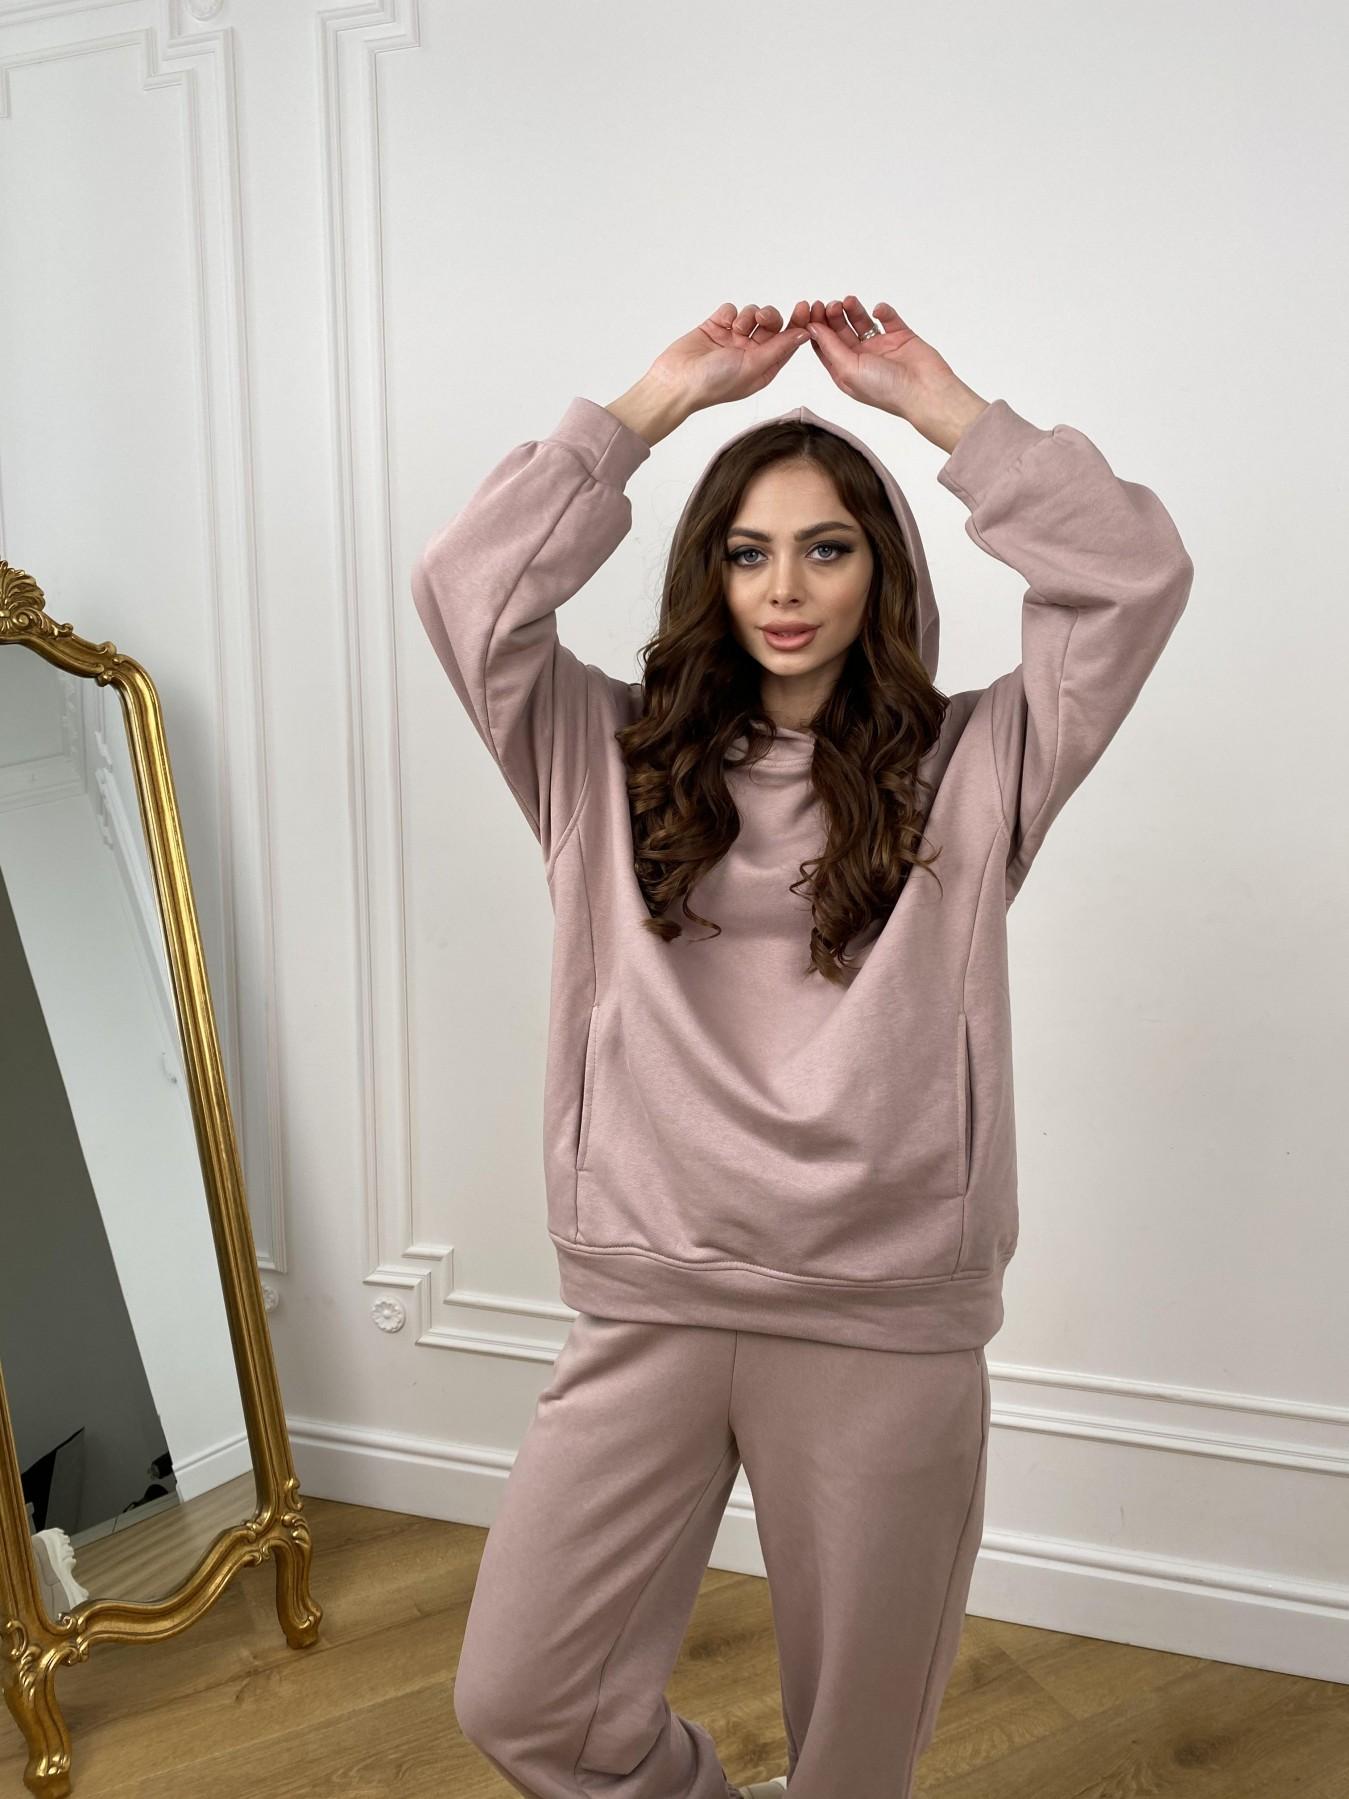 Марион костюм из 3х нитки 10581 АРТ. 46961 Цвет: Кофе - фото 2, интернет магазин tm-modus.ru